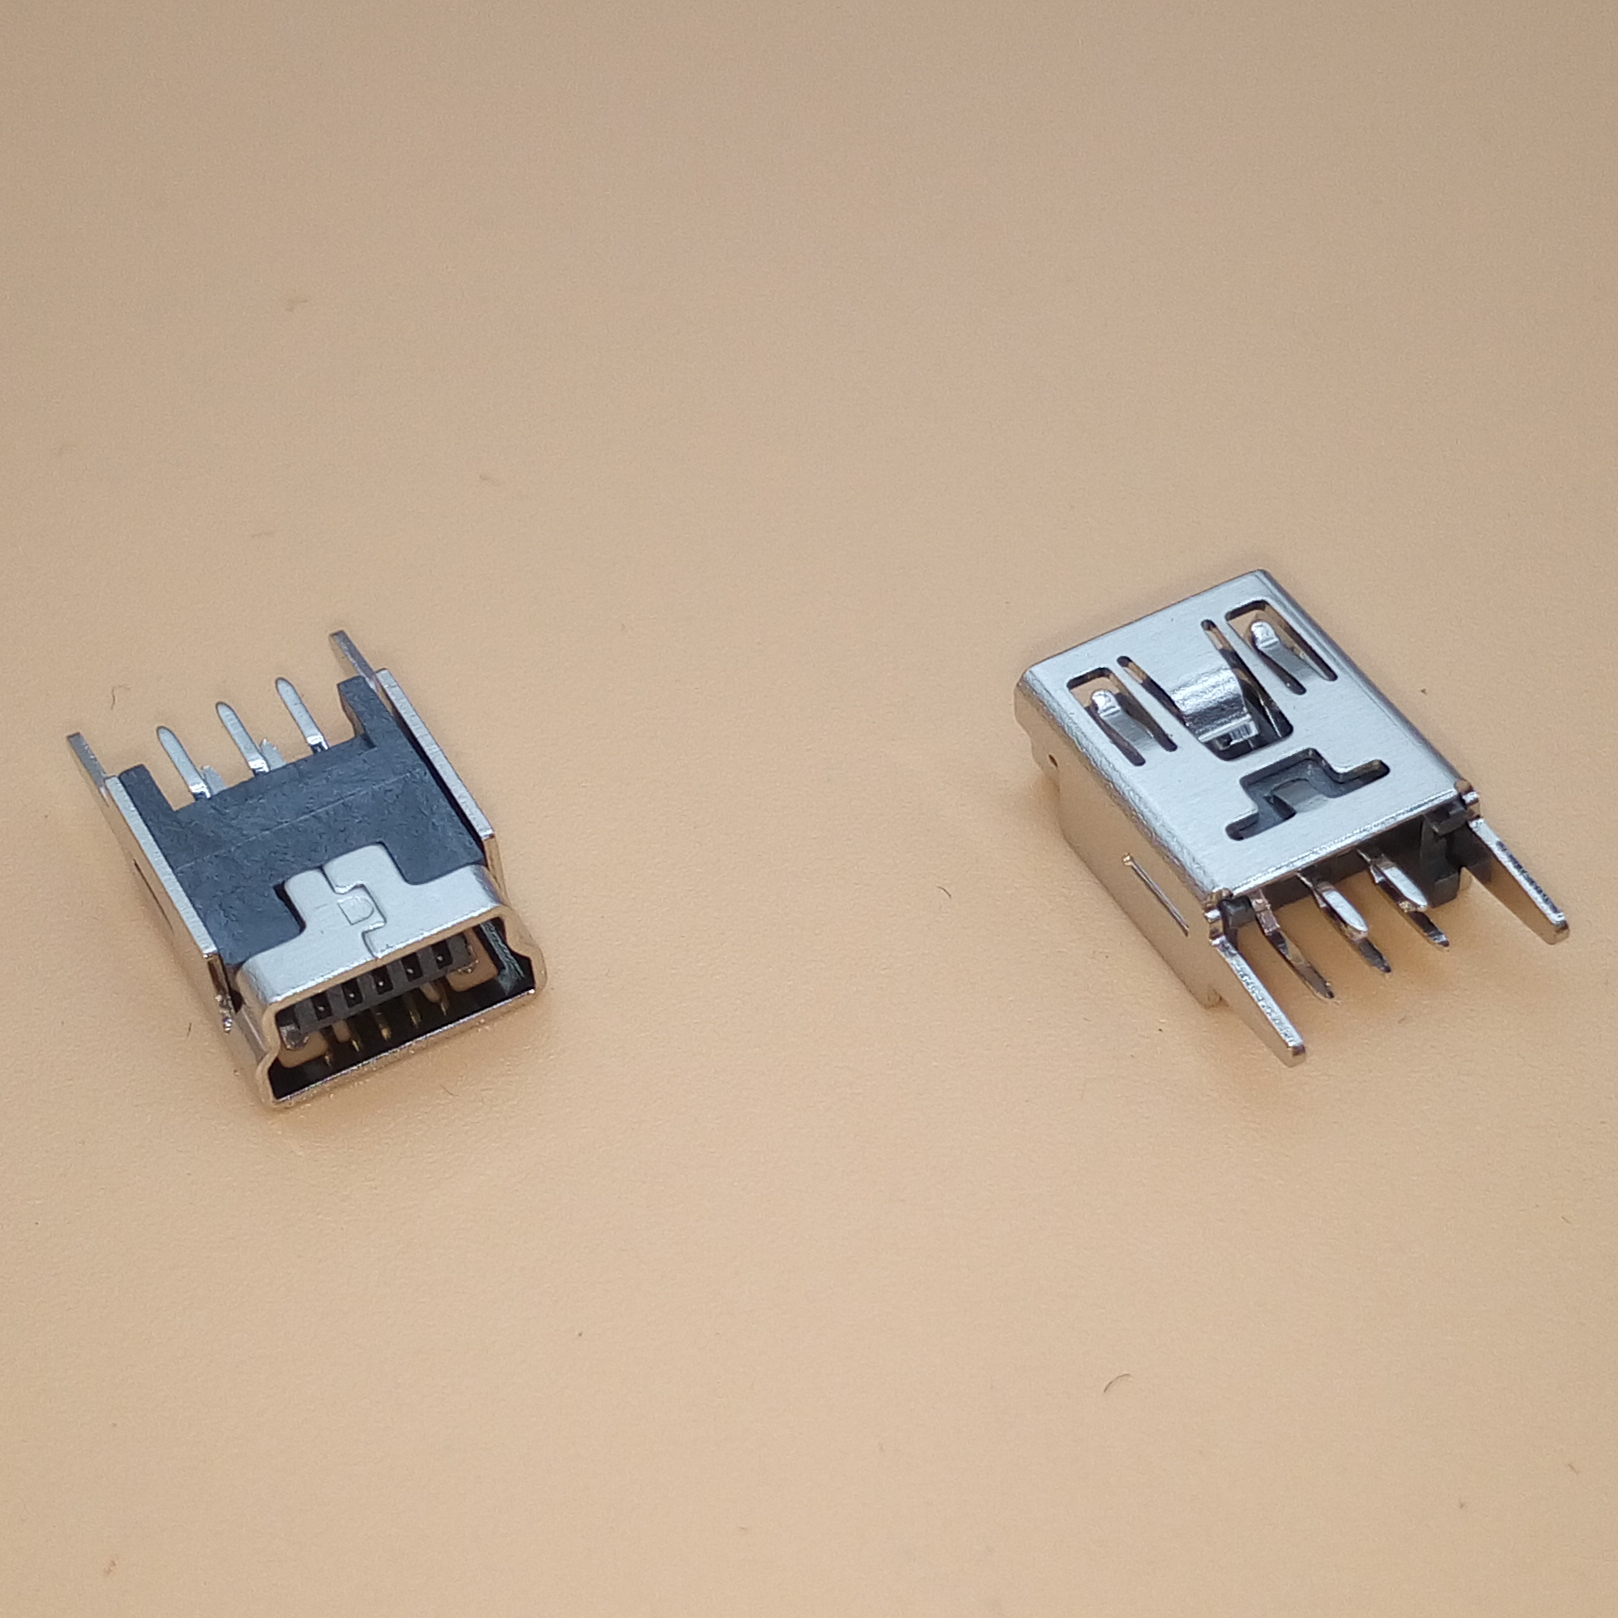 10Pcs Mini USB Female 5 Pin Type B Right Angle PCB Socket Connector 2 Legs RS